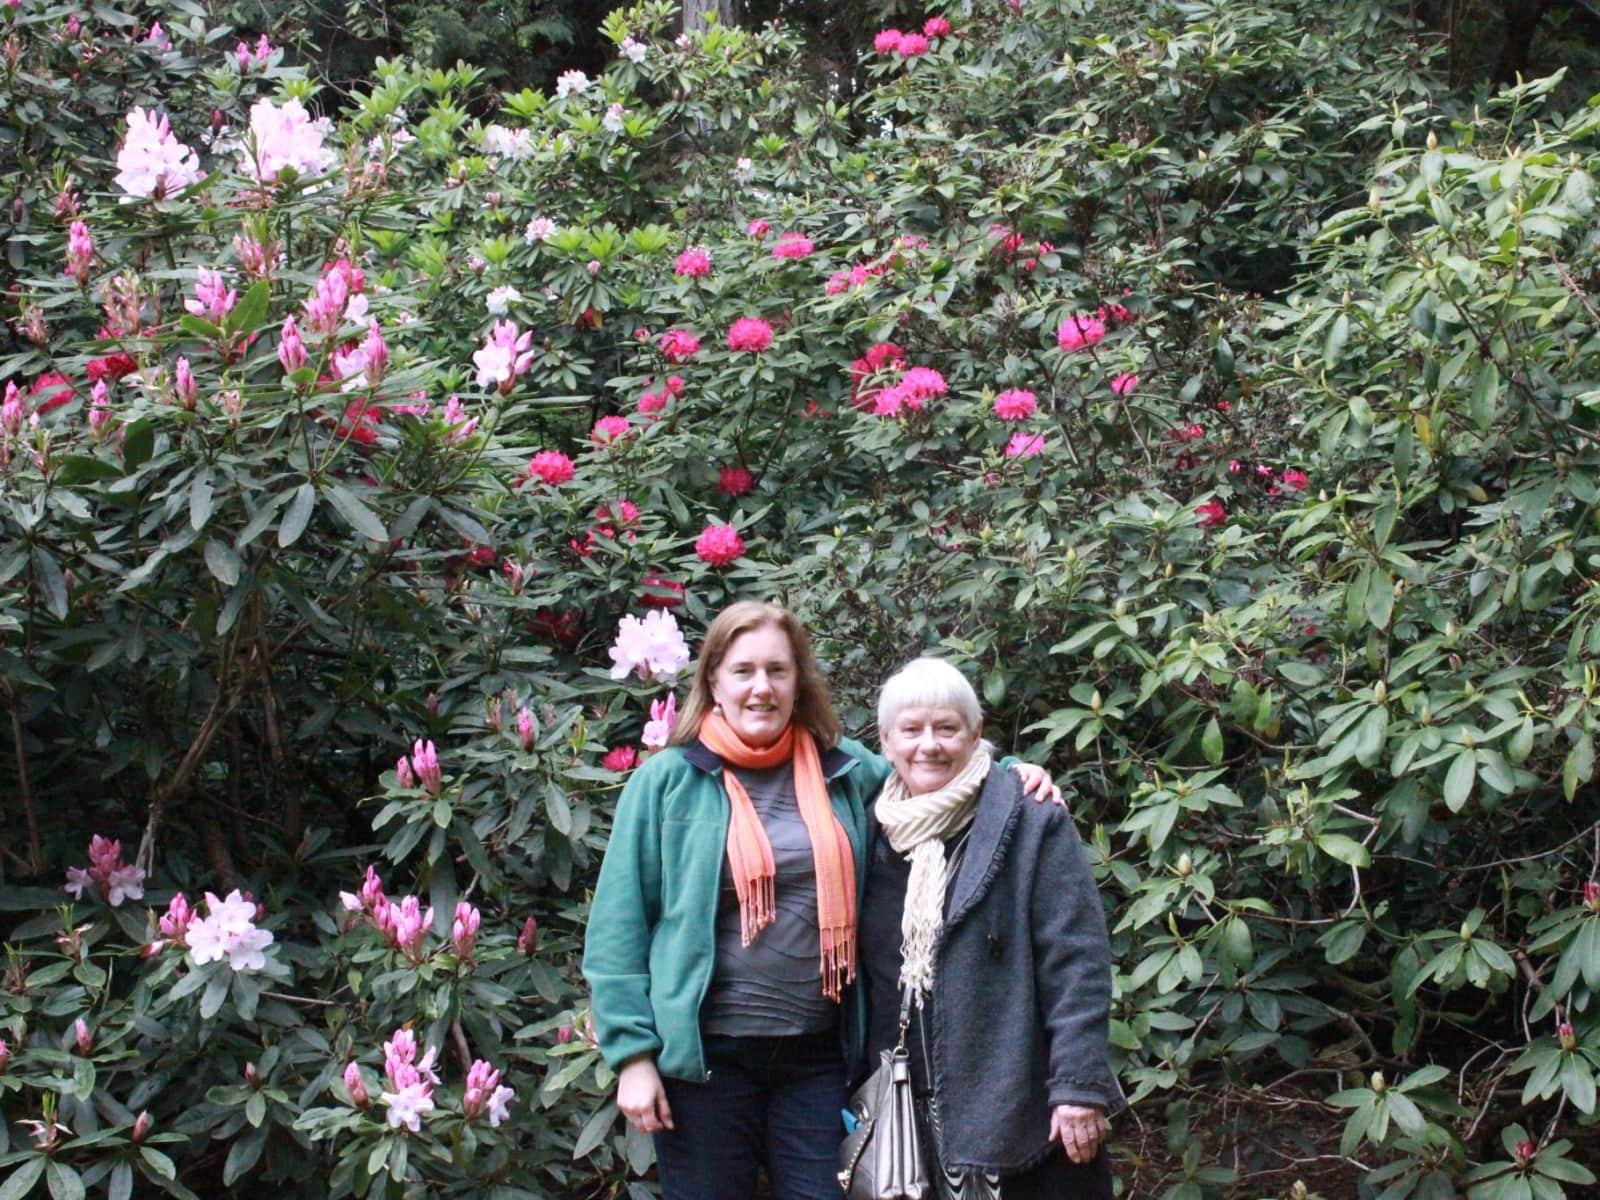 Susan from Seattle, Washington, United States